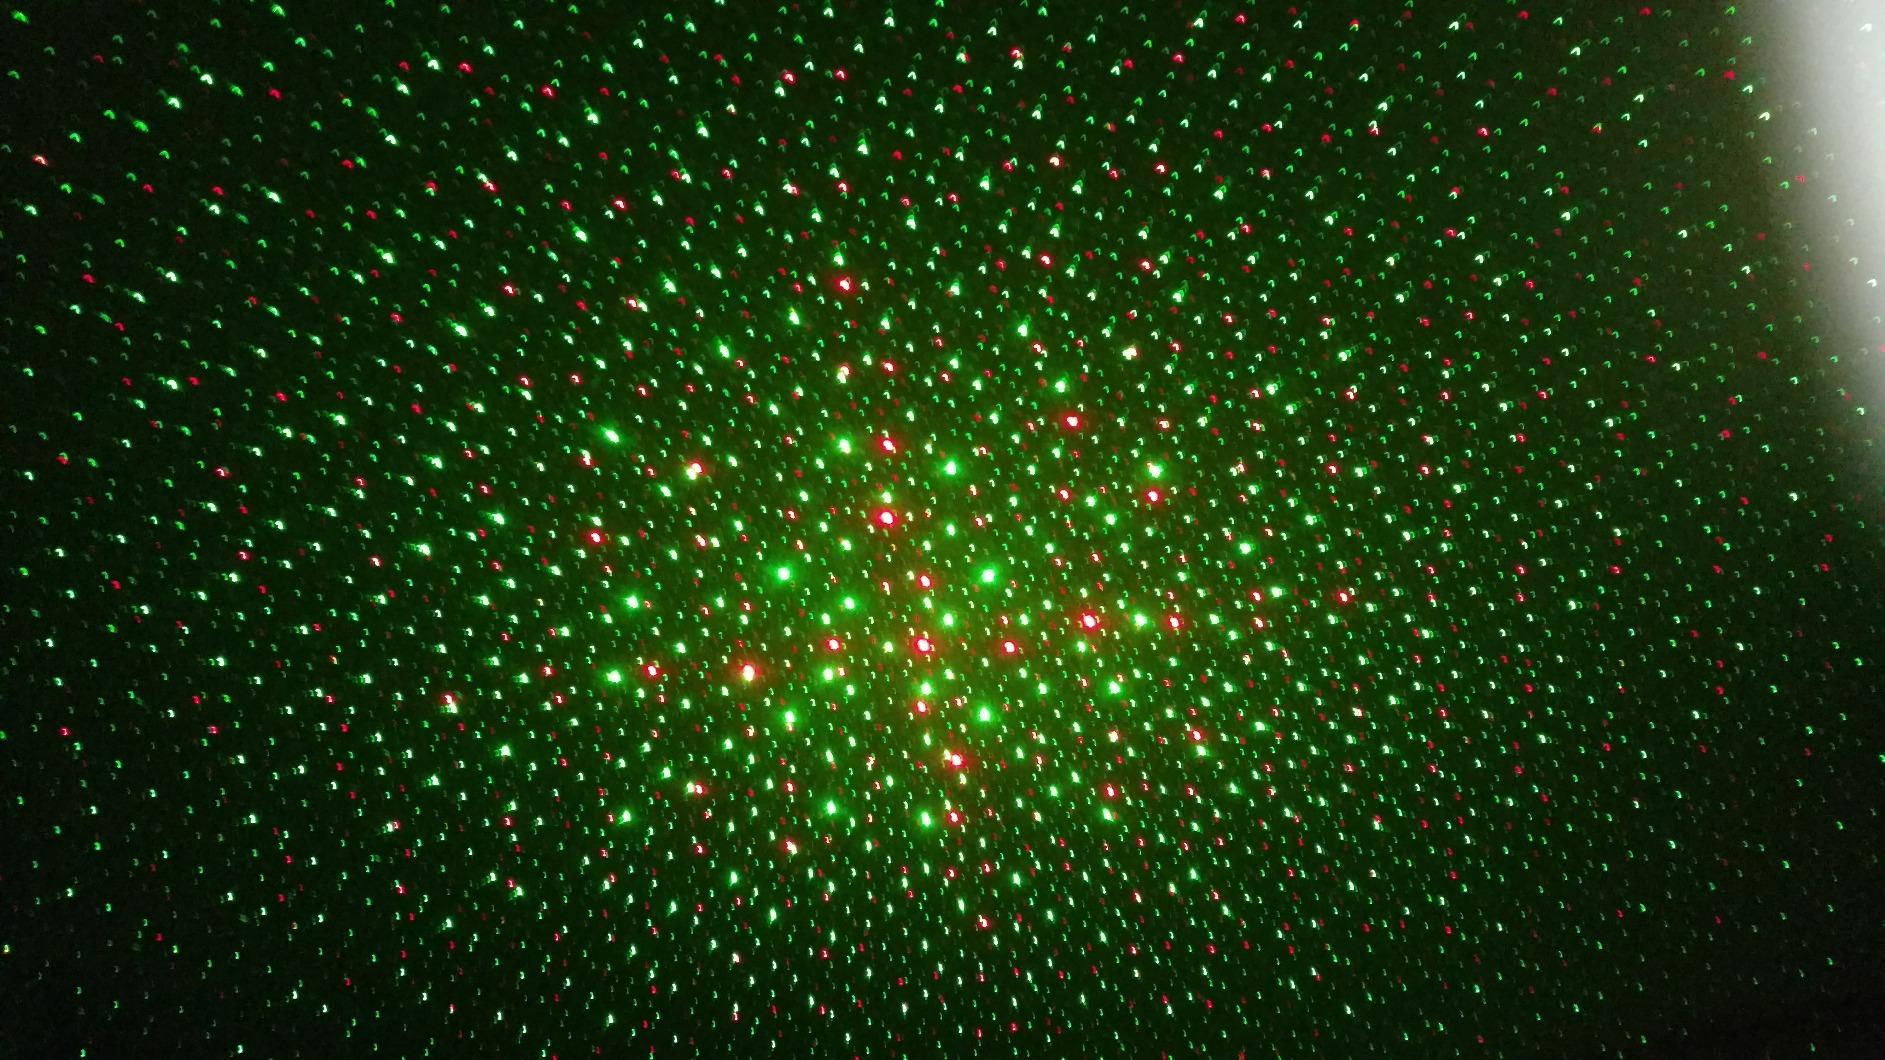 Firefly lights are great XLASERLIGHT